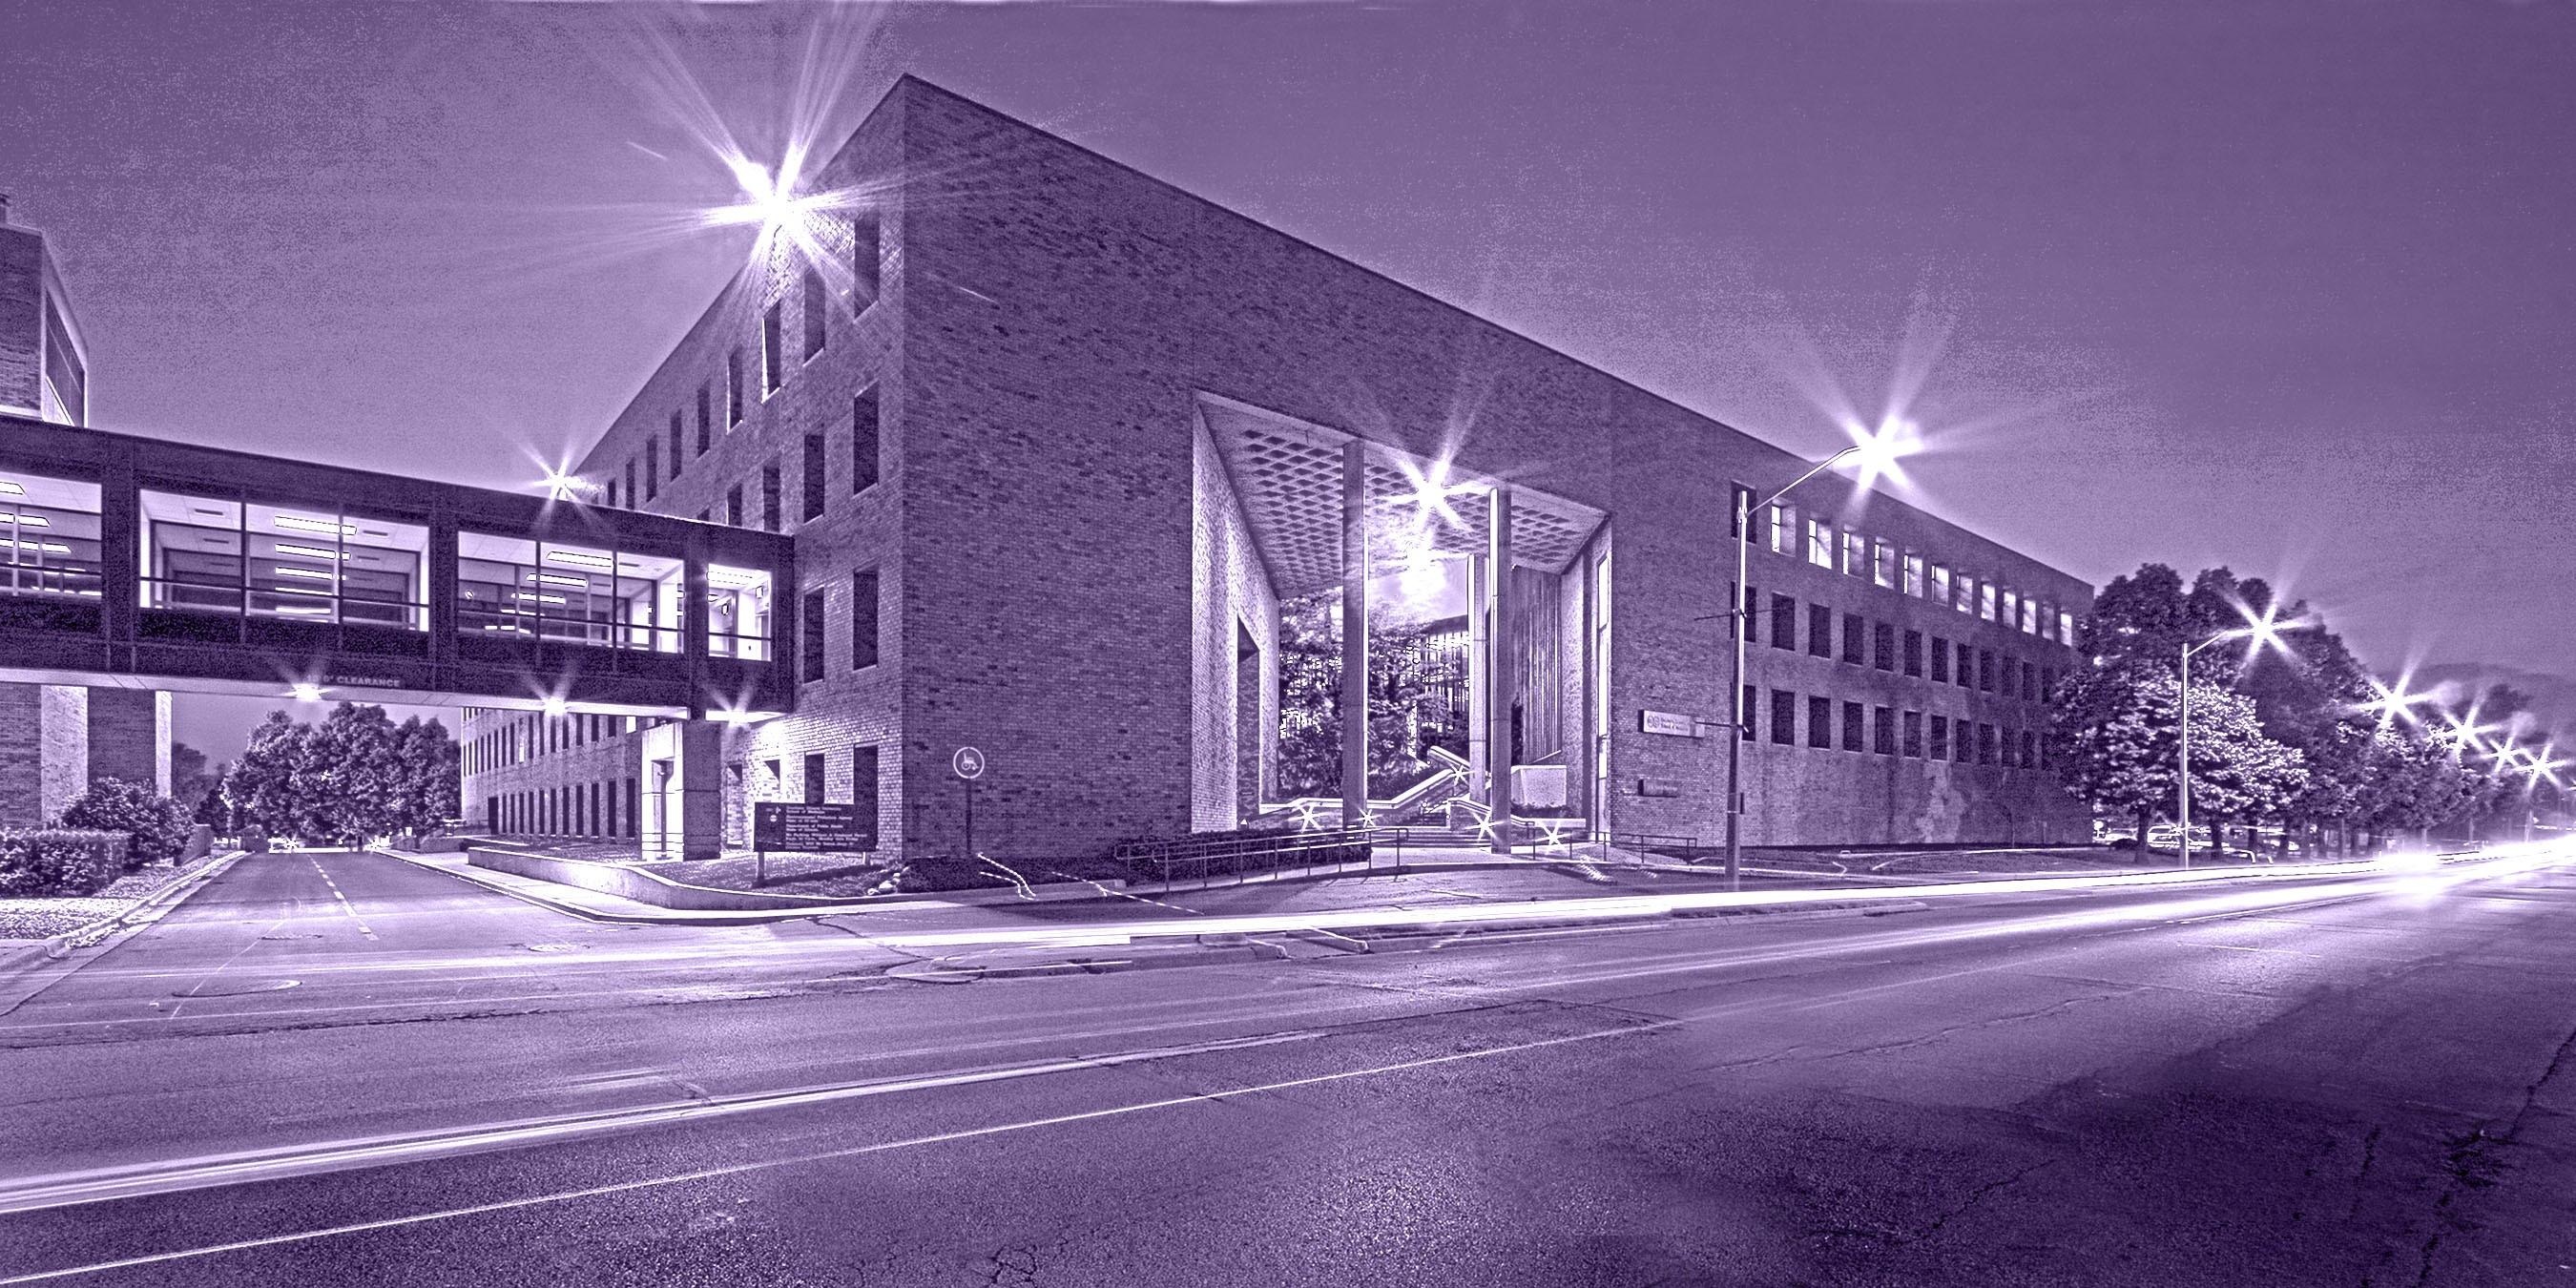 Southern Illinois University School of Medicine | LinkedIn